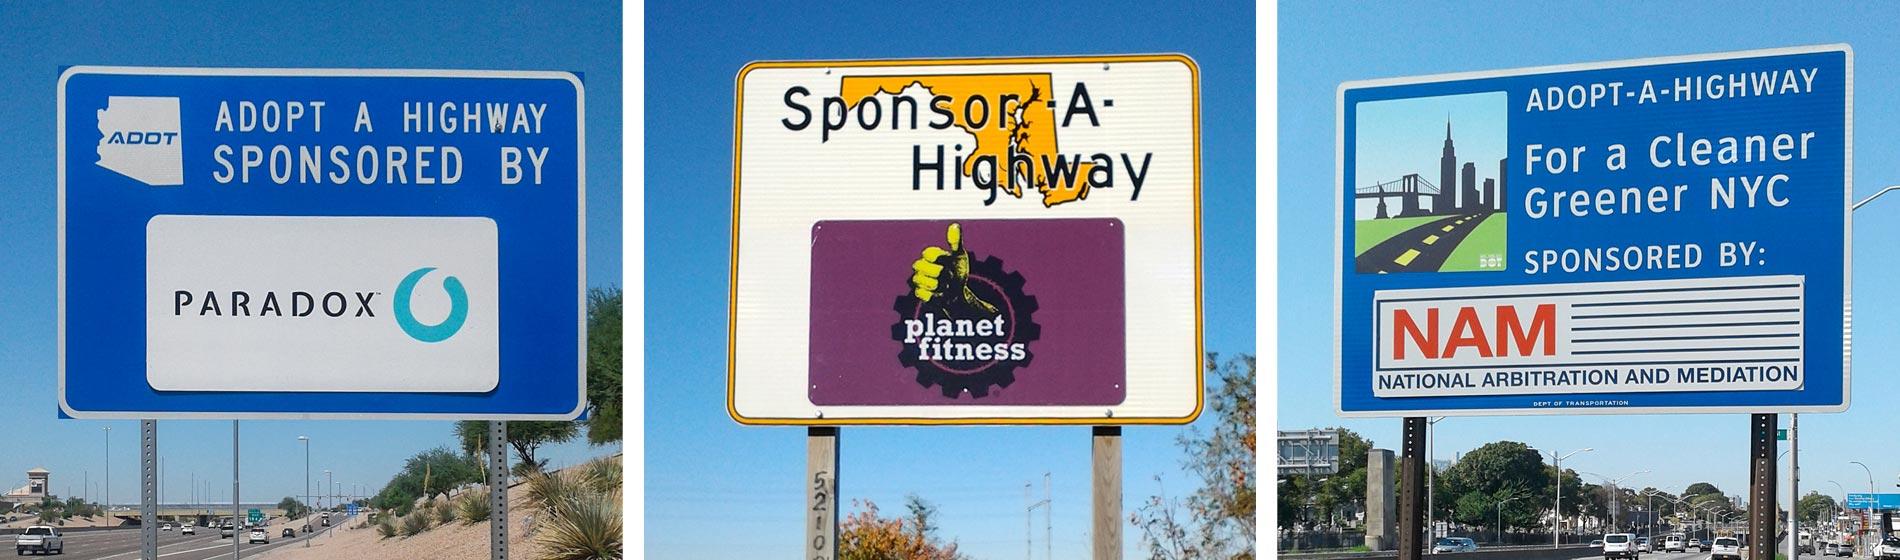 sponsor-a-highway signs